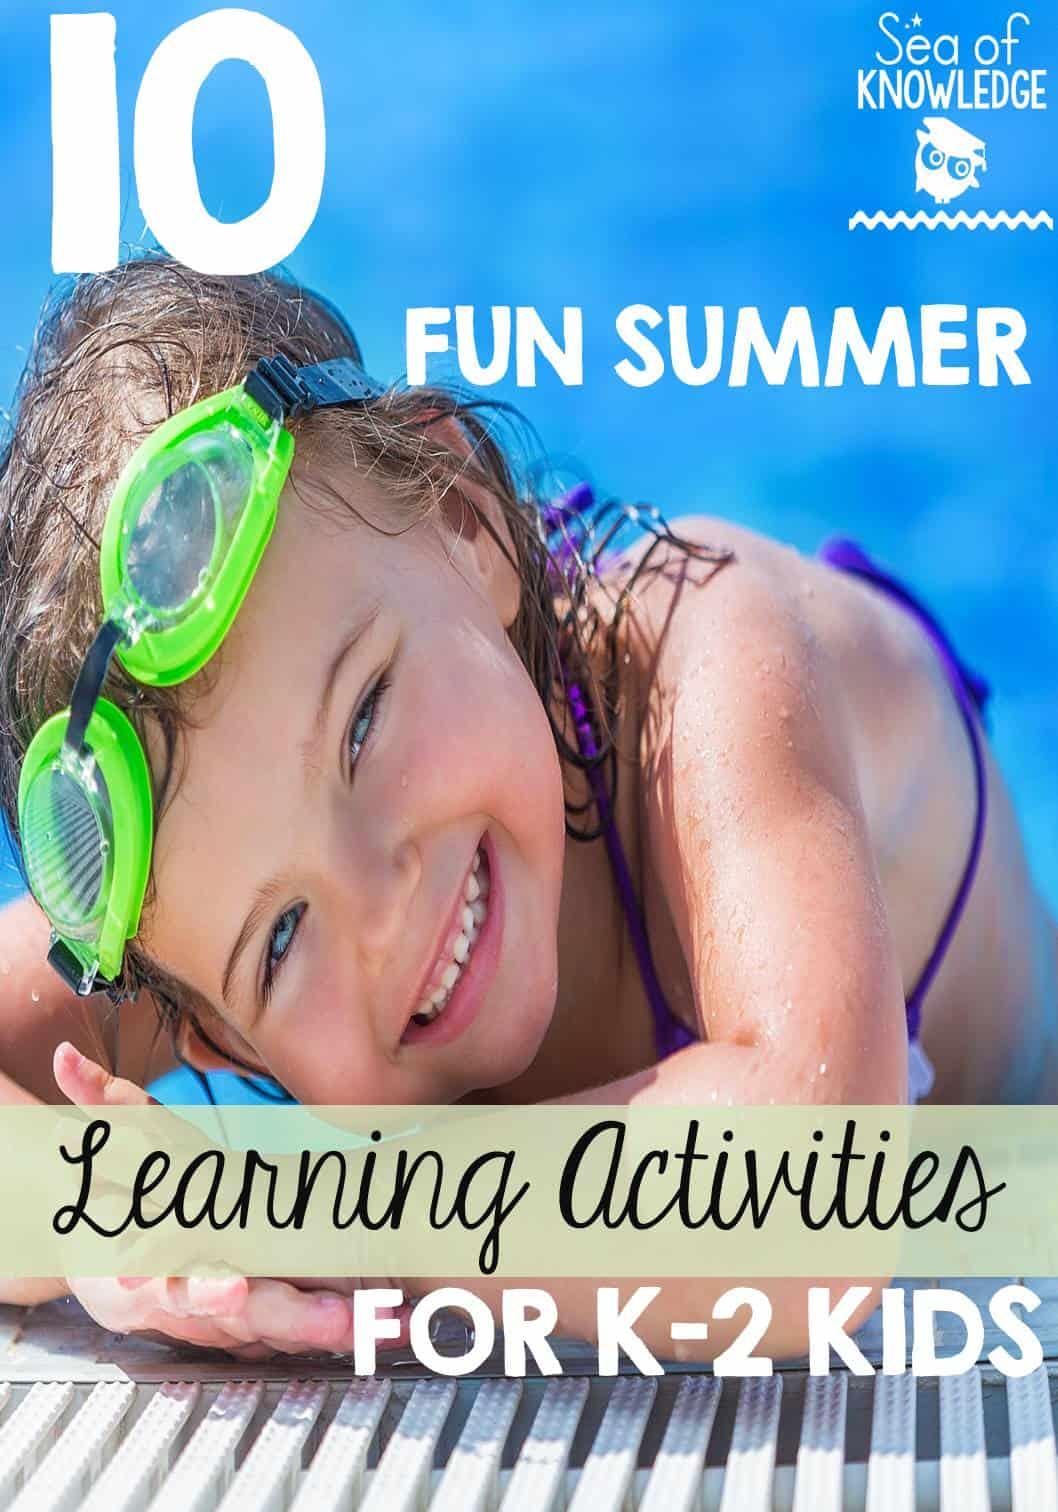 Summer Learning Activities For School Kids In K 2